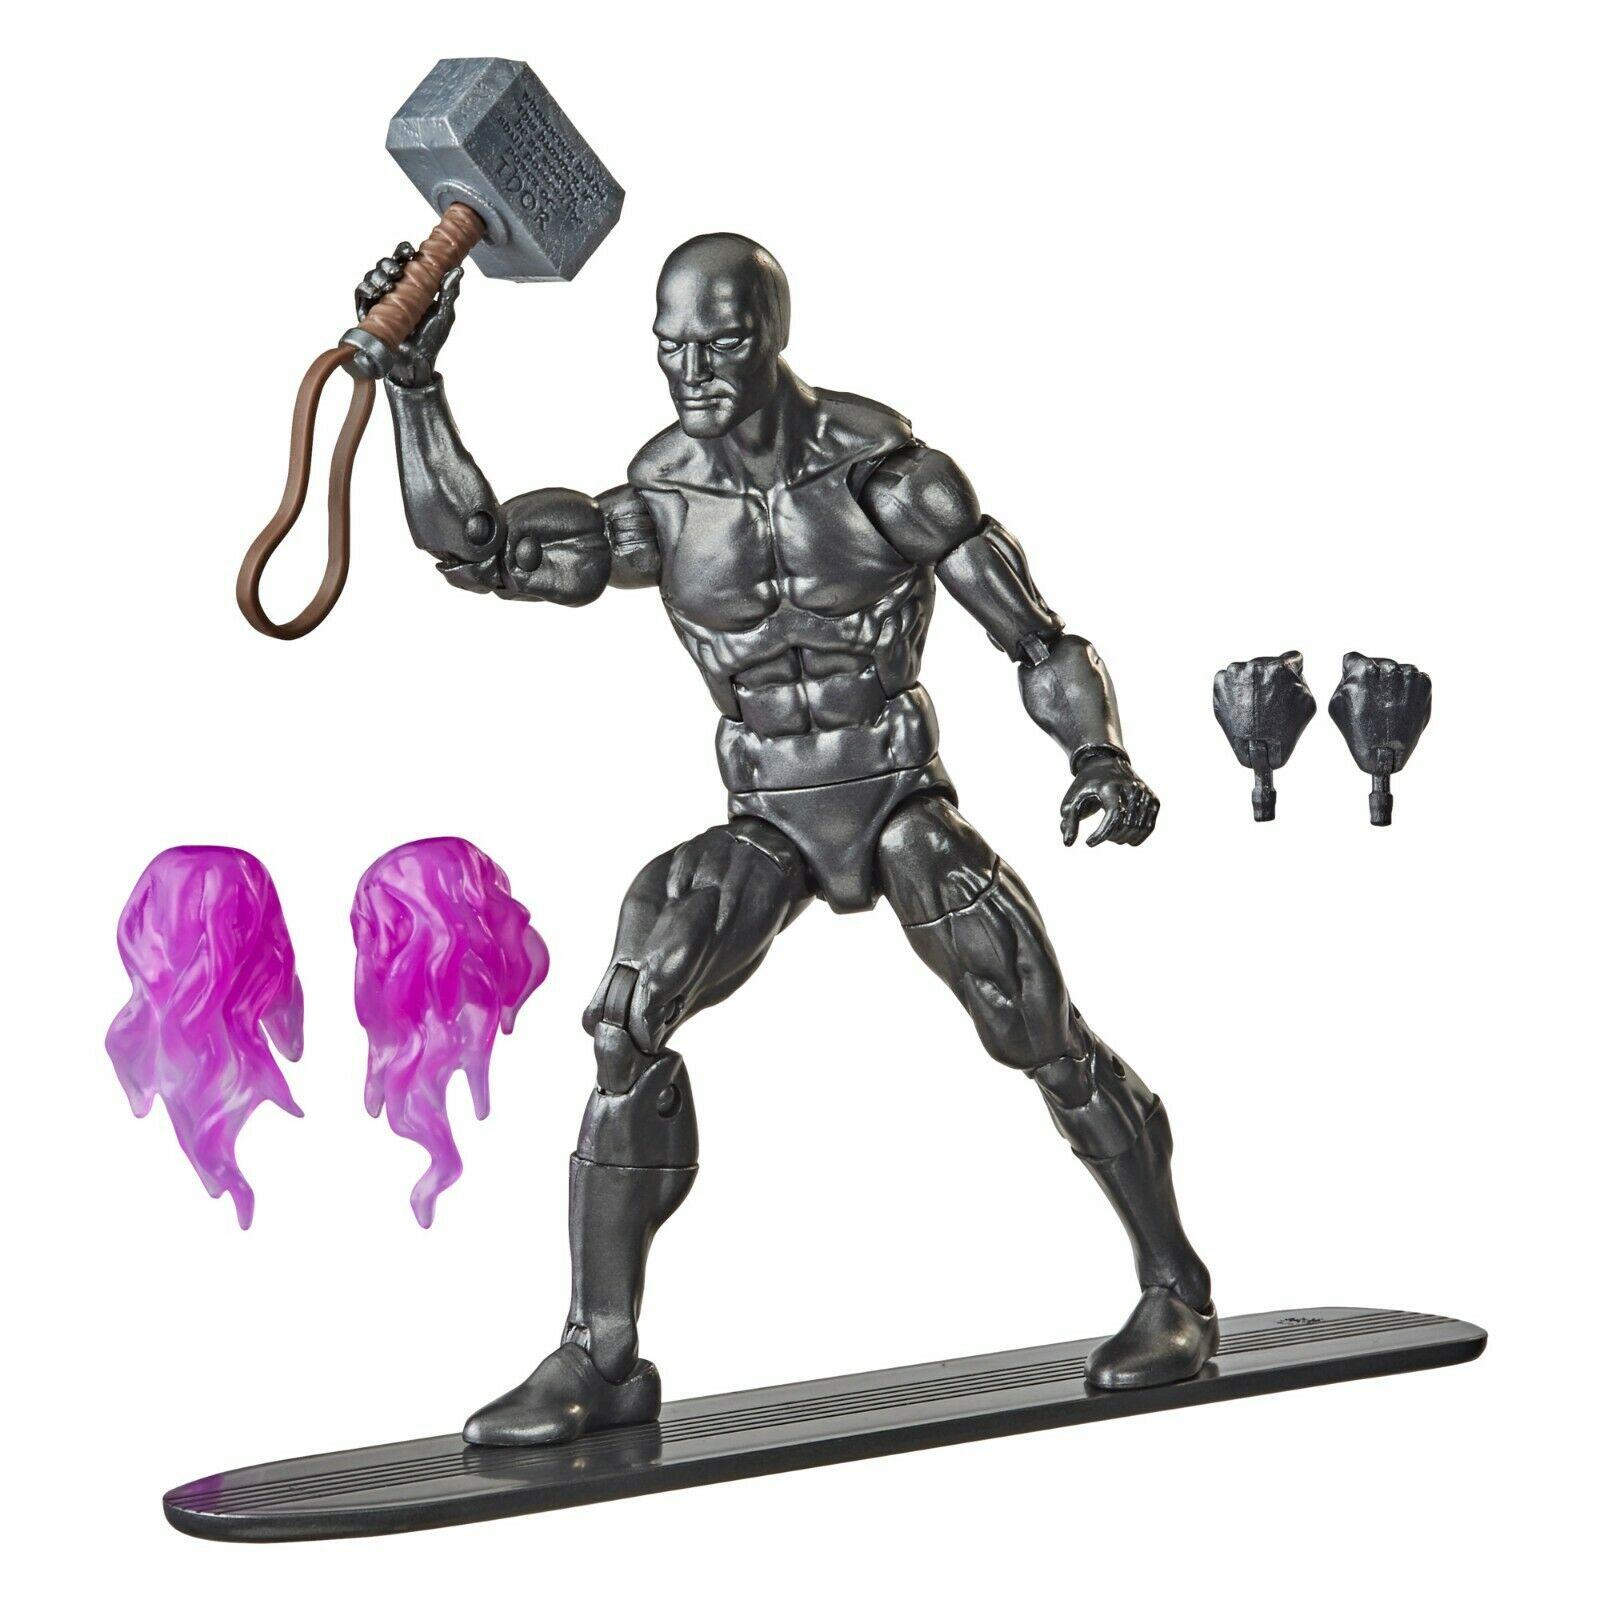 Action Figure Surfista Prateado (Silver Surfer) Obsidian Surfer: Marvel Legends Series - Hasbro